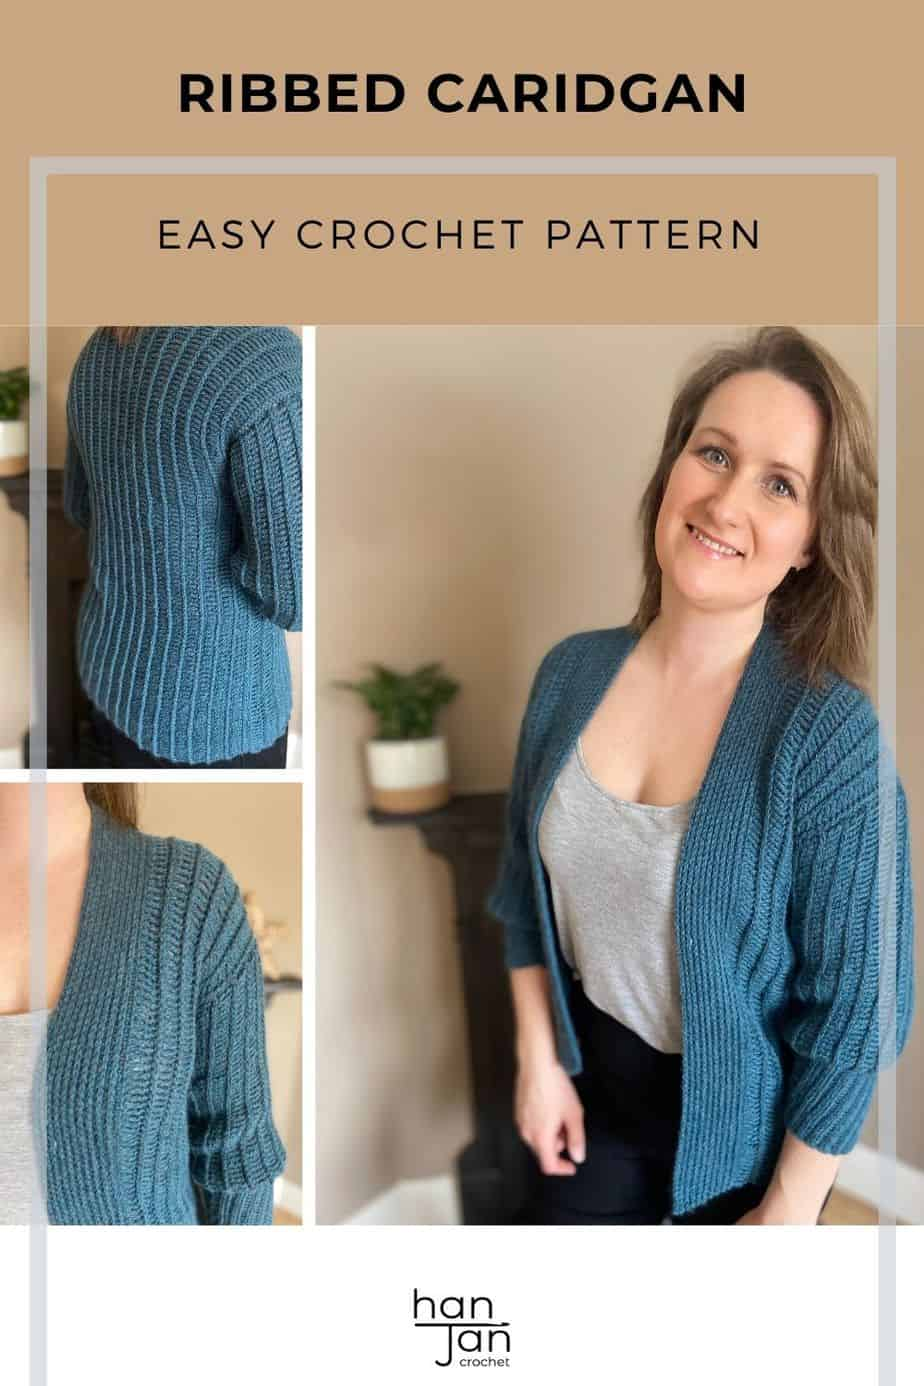 Sydney Cardigan knit look crochet pattern pin 2